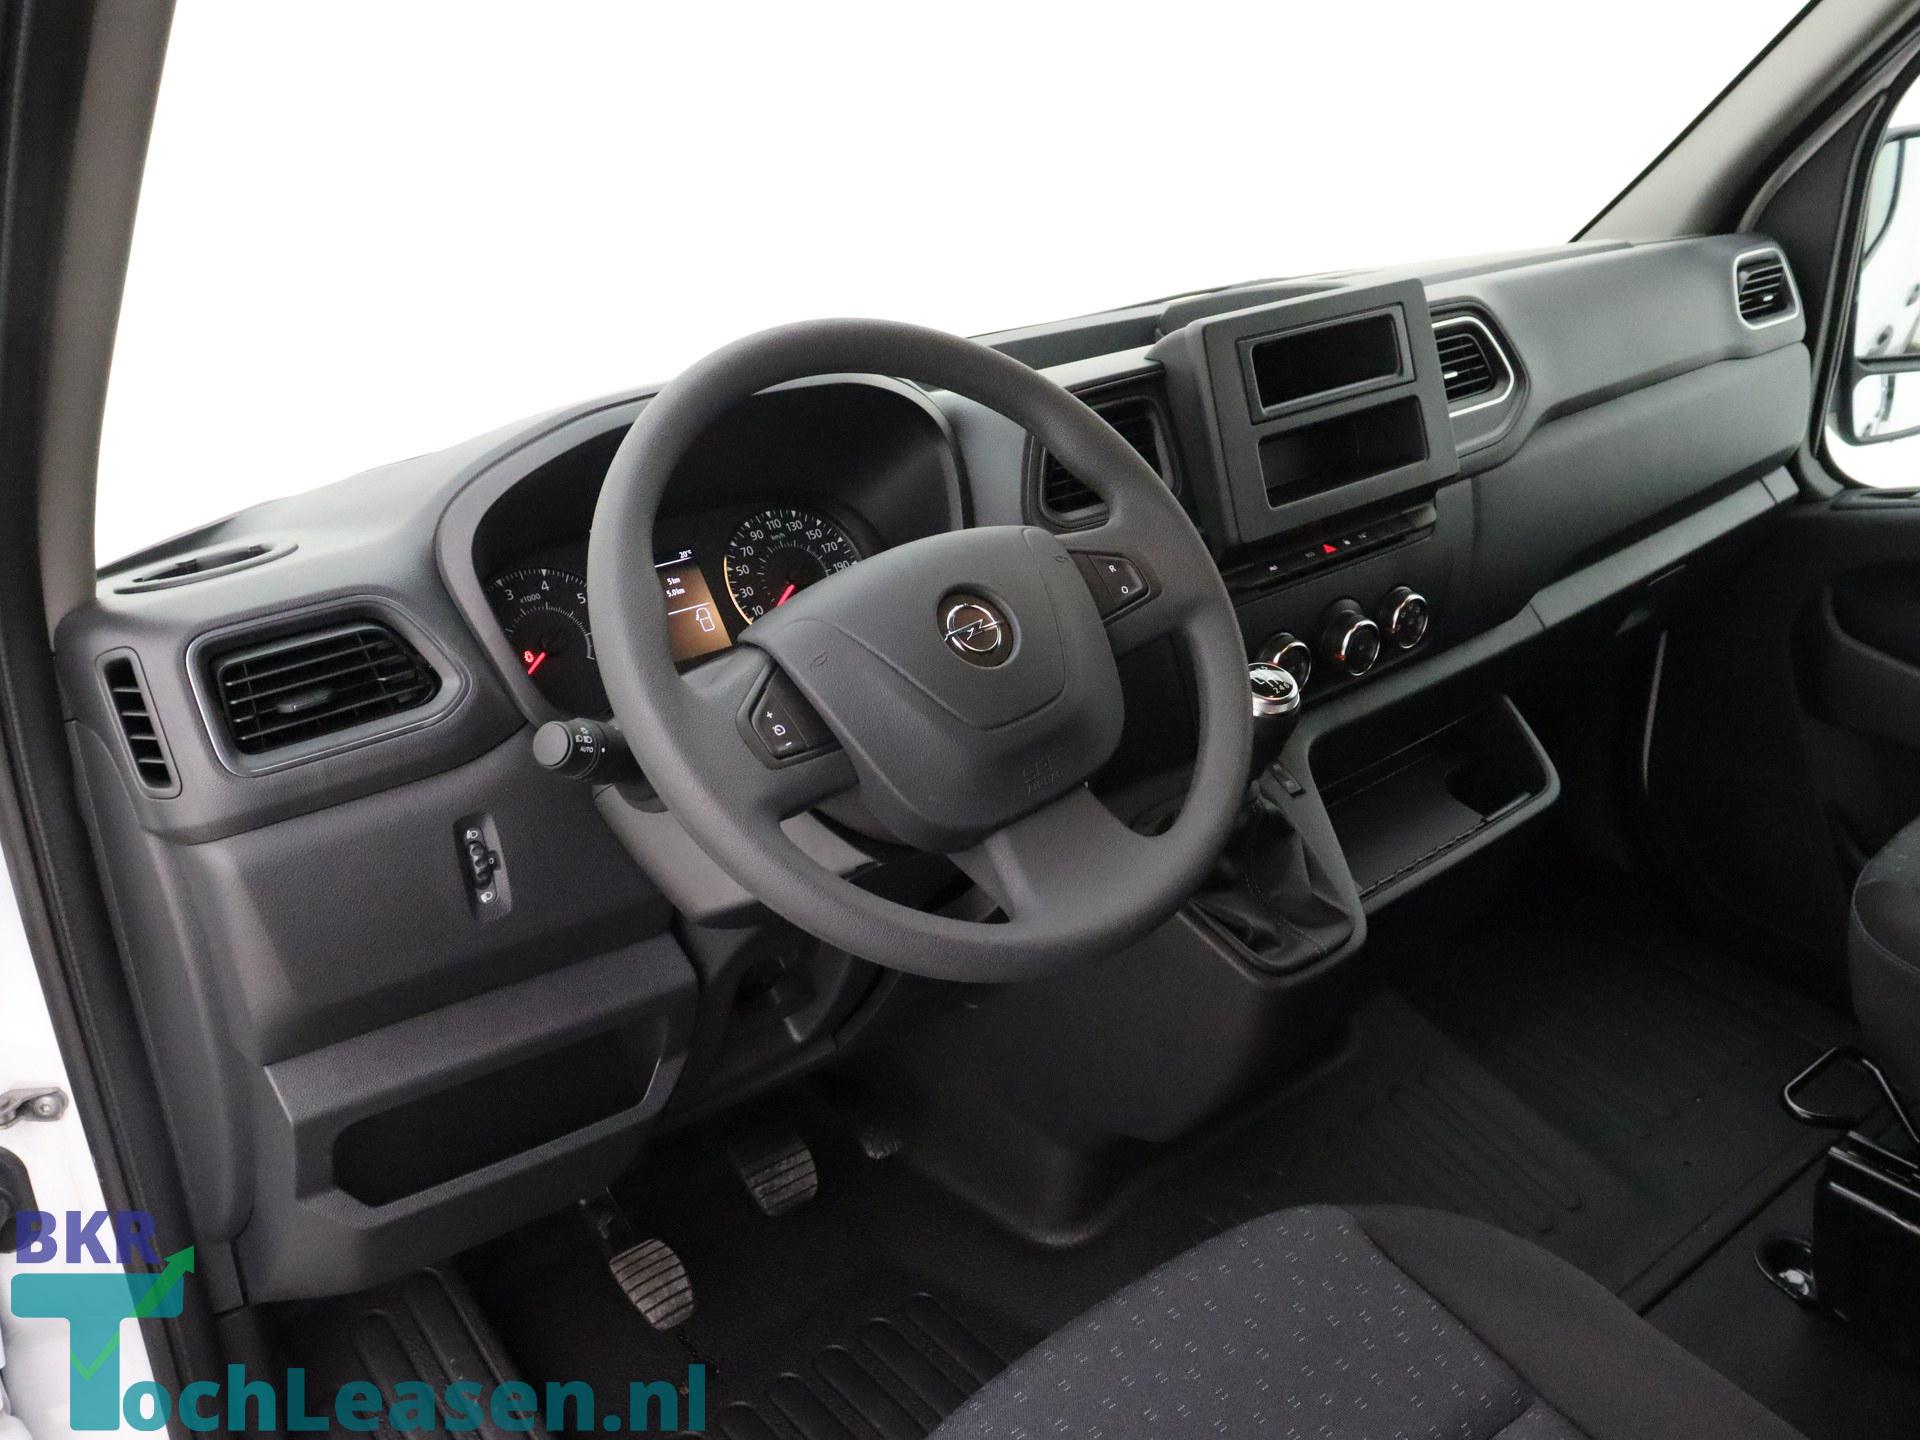 BKRTochLeasen.nl - Opel Movano - L3H2 - wit 03